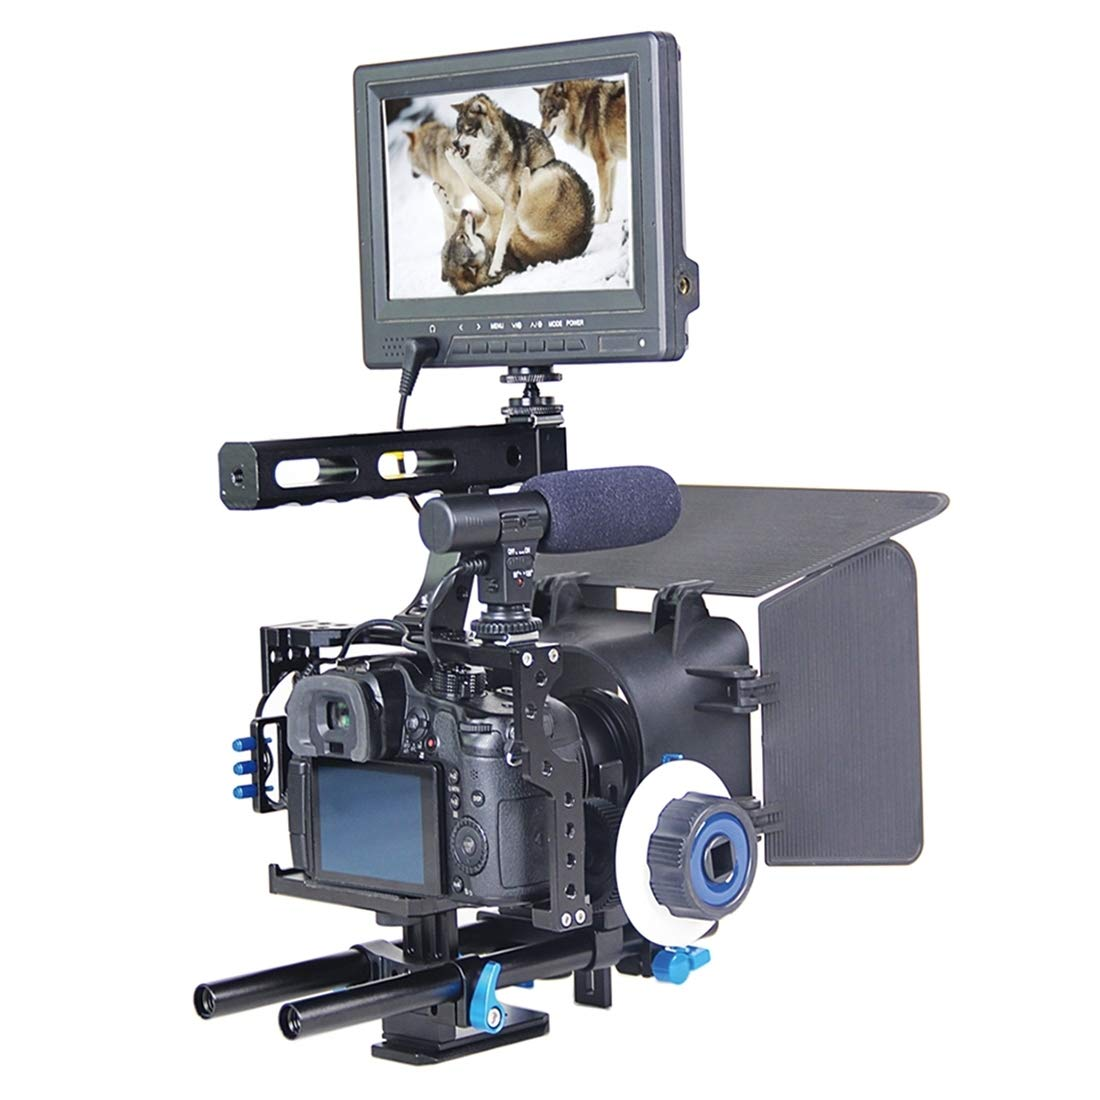 Shenbiadolr カメラショルダーサポート YLG0904A ハンドルビデオケージキット マットボックス付き フォローフォーカス パナソニック Lumix DMC-GH4 ソニー A7 A7S A7R A7RII A7SII用   B07L3TSMKT